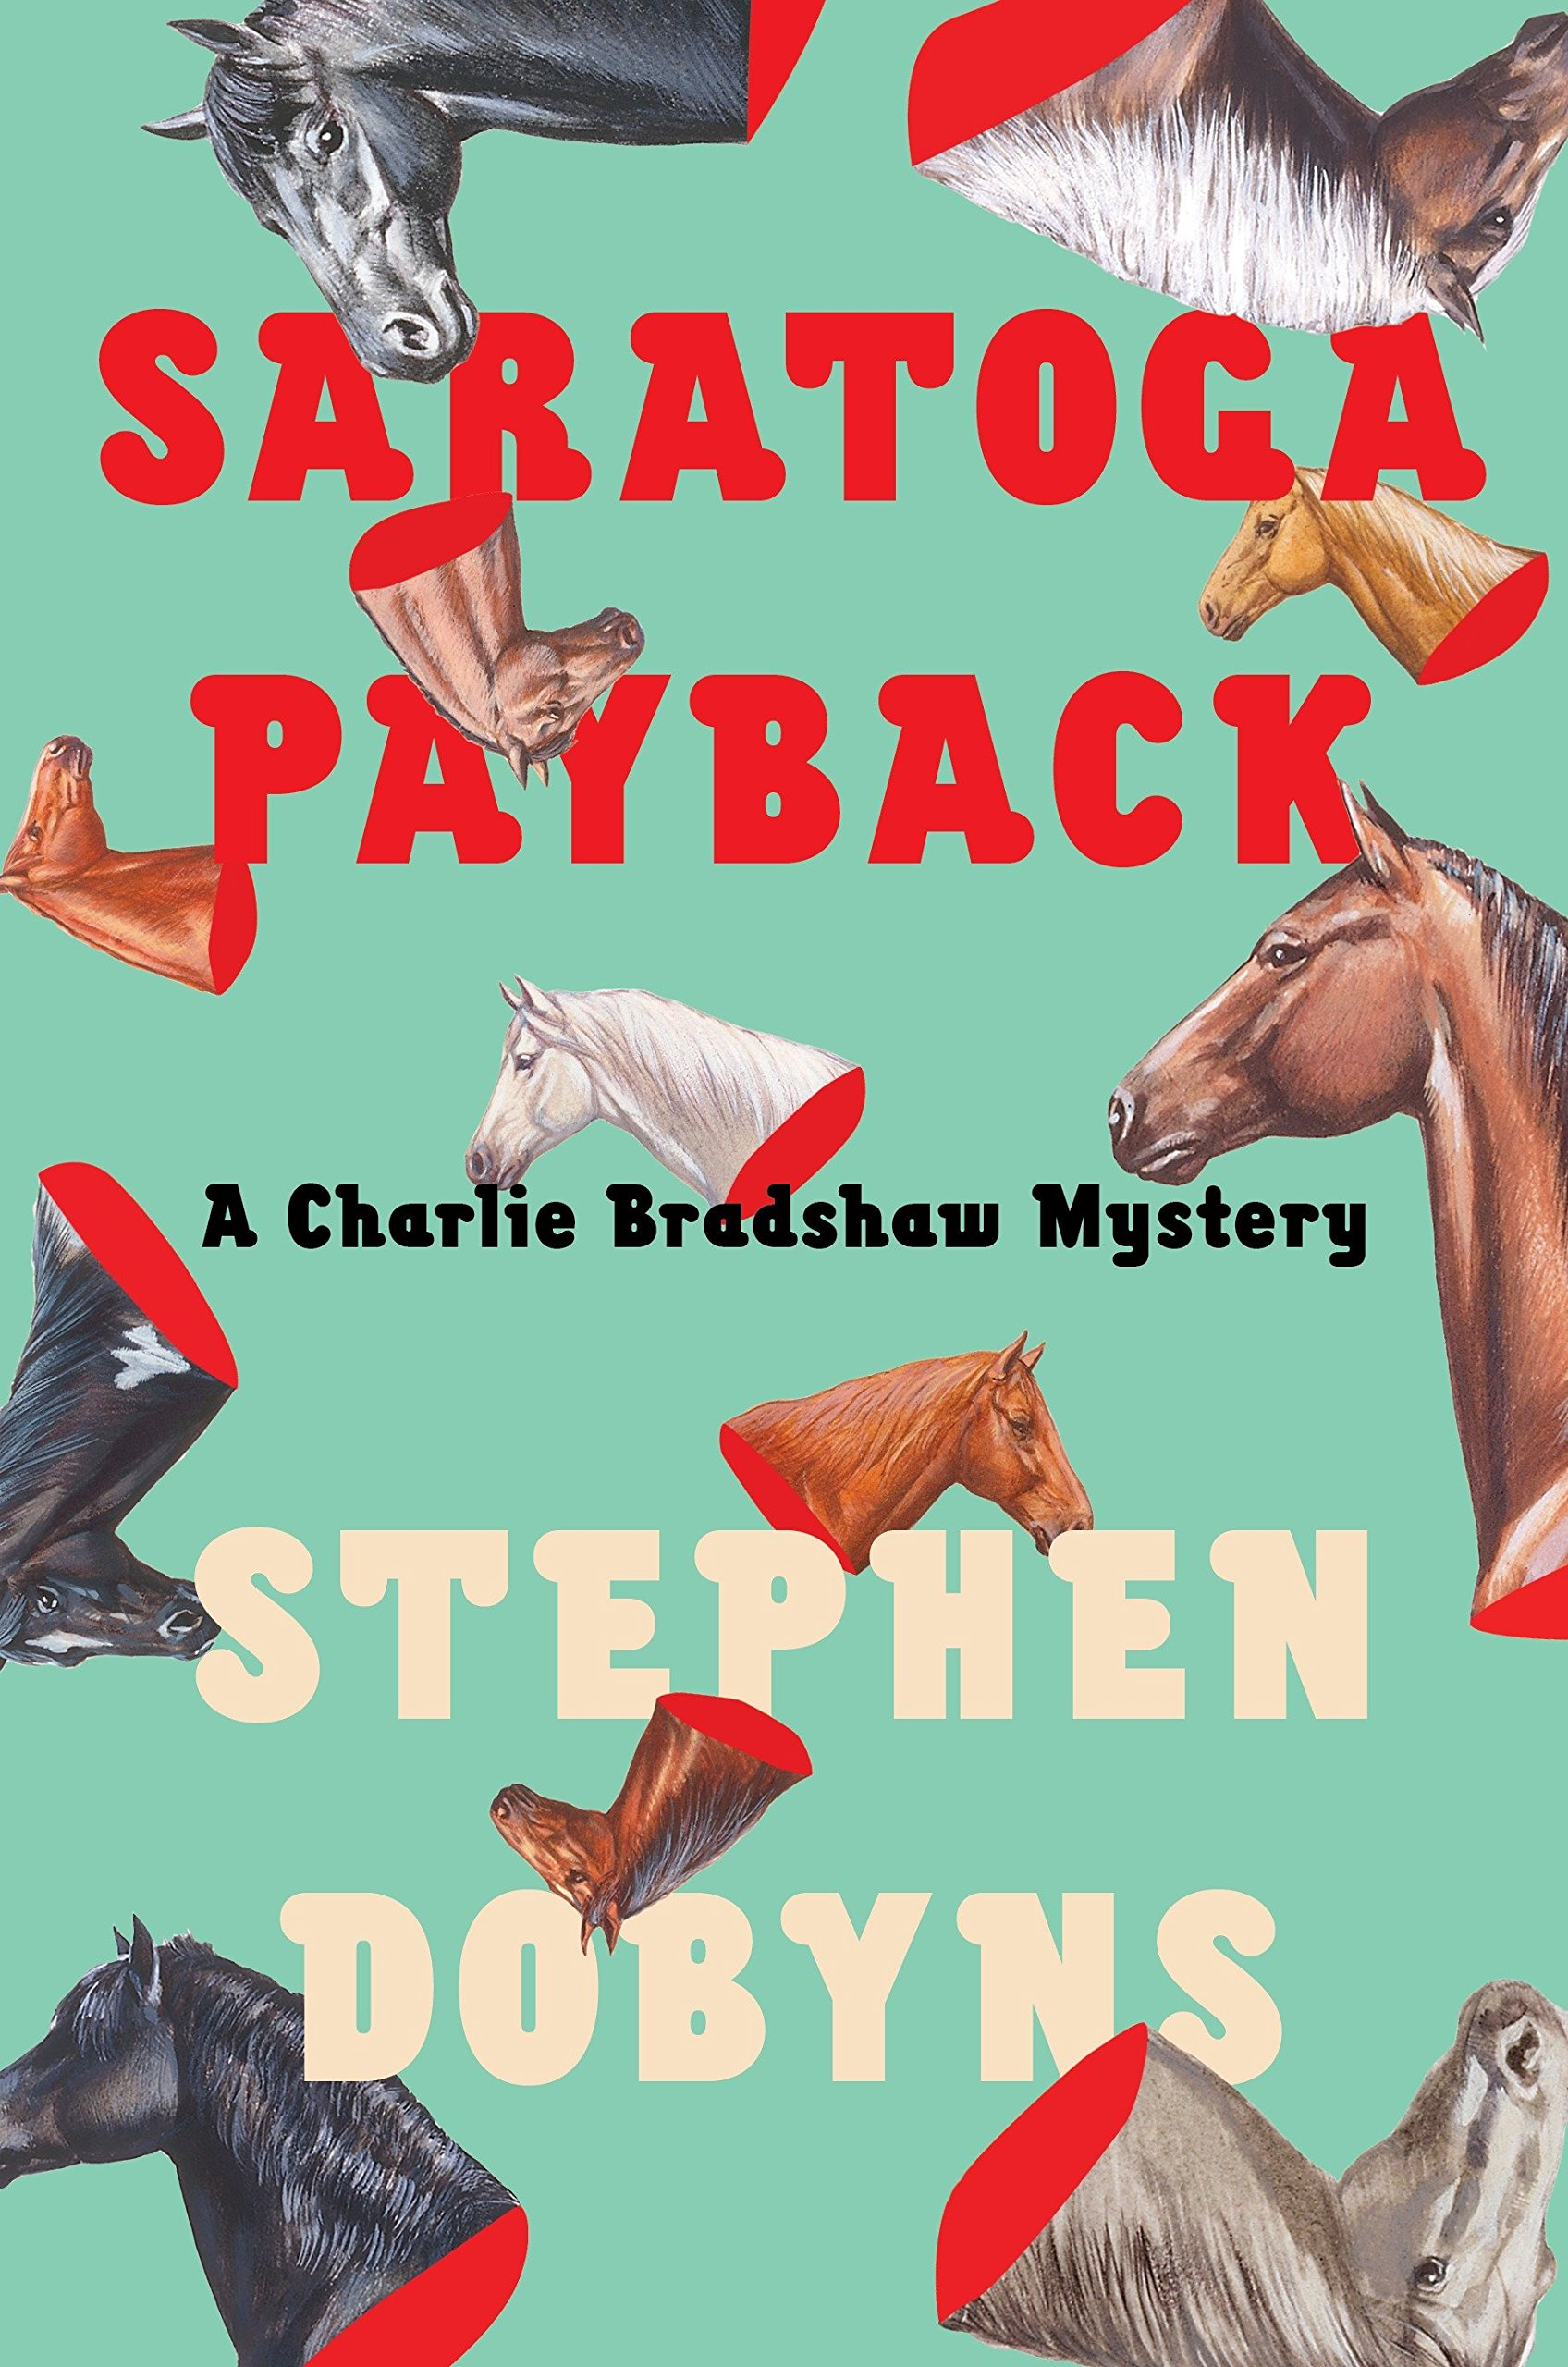 Saratoga Payback (Charlie Bradshaw Mystery) ebook